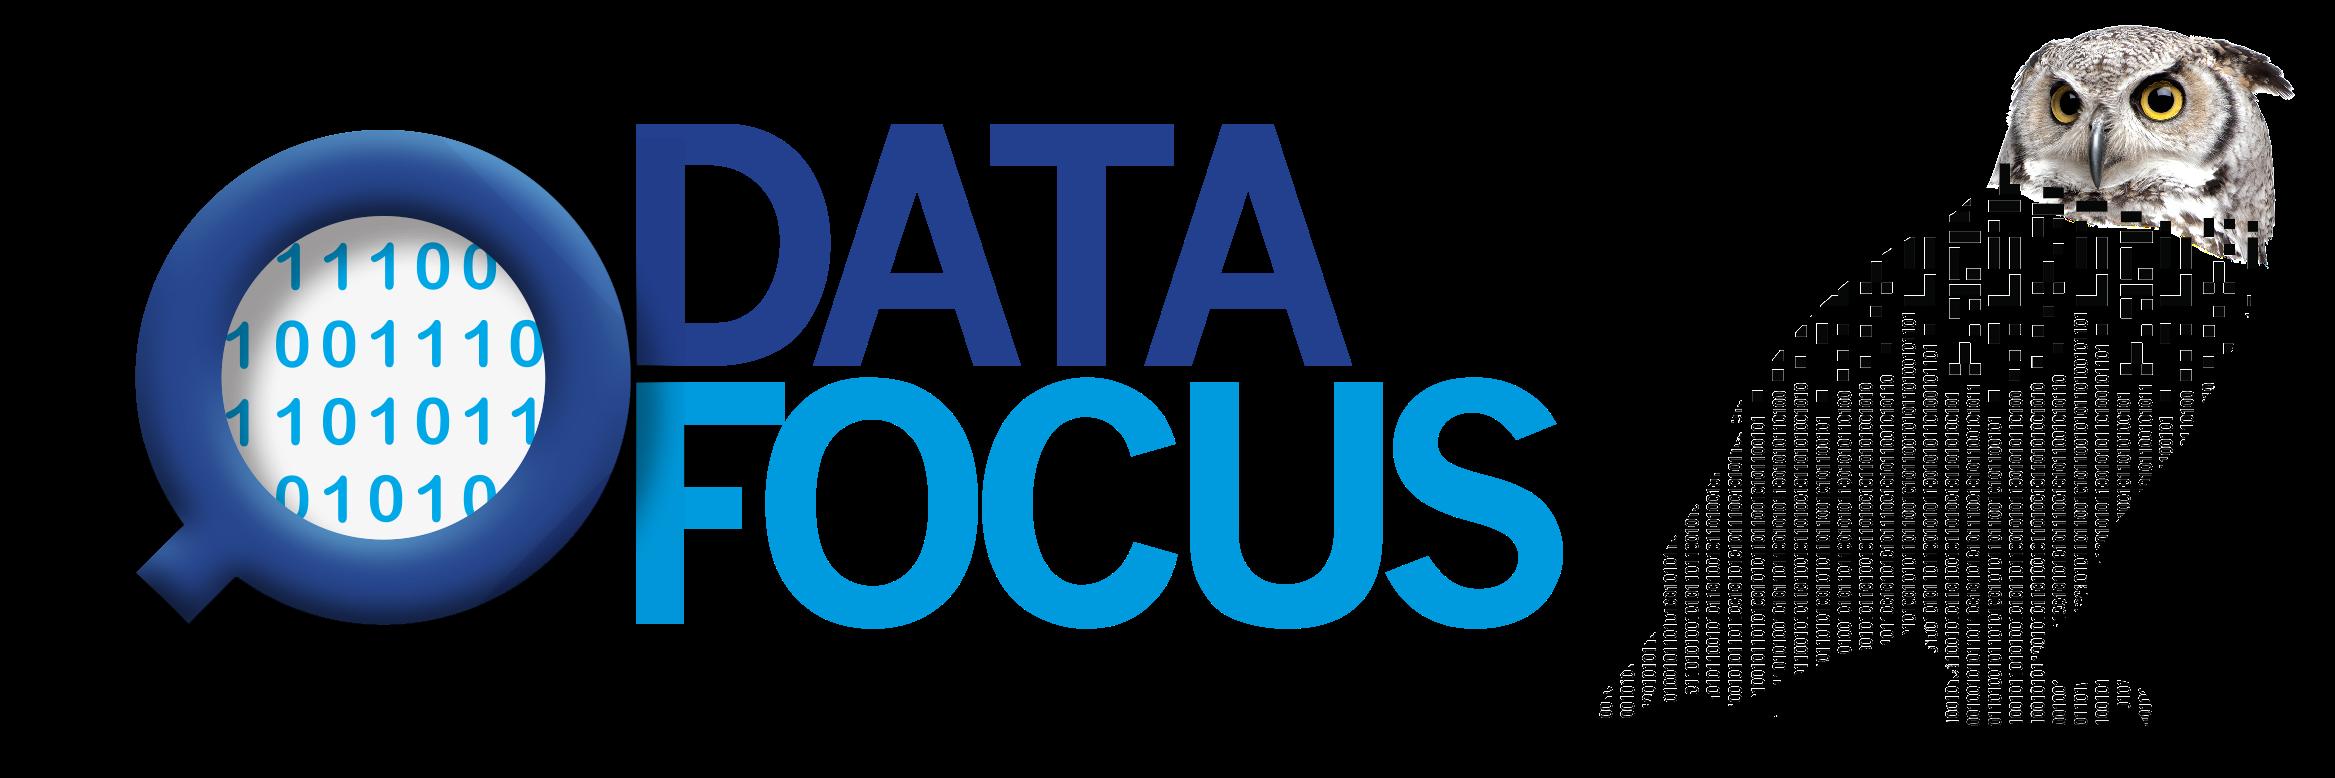 DataFocus 2015 | INsig2